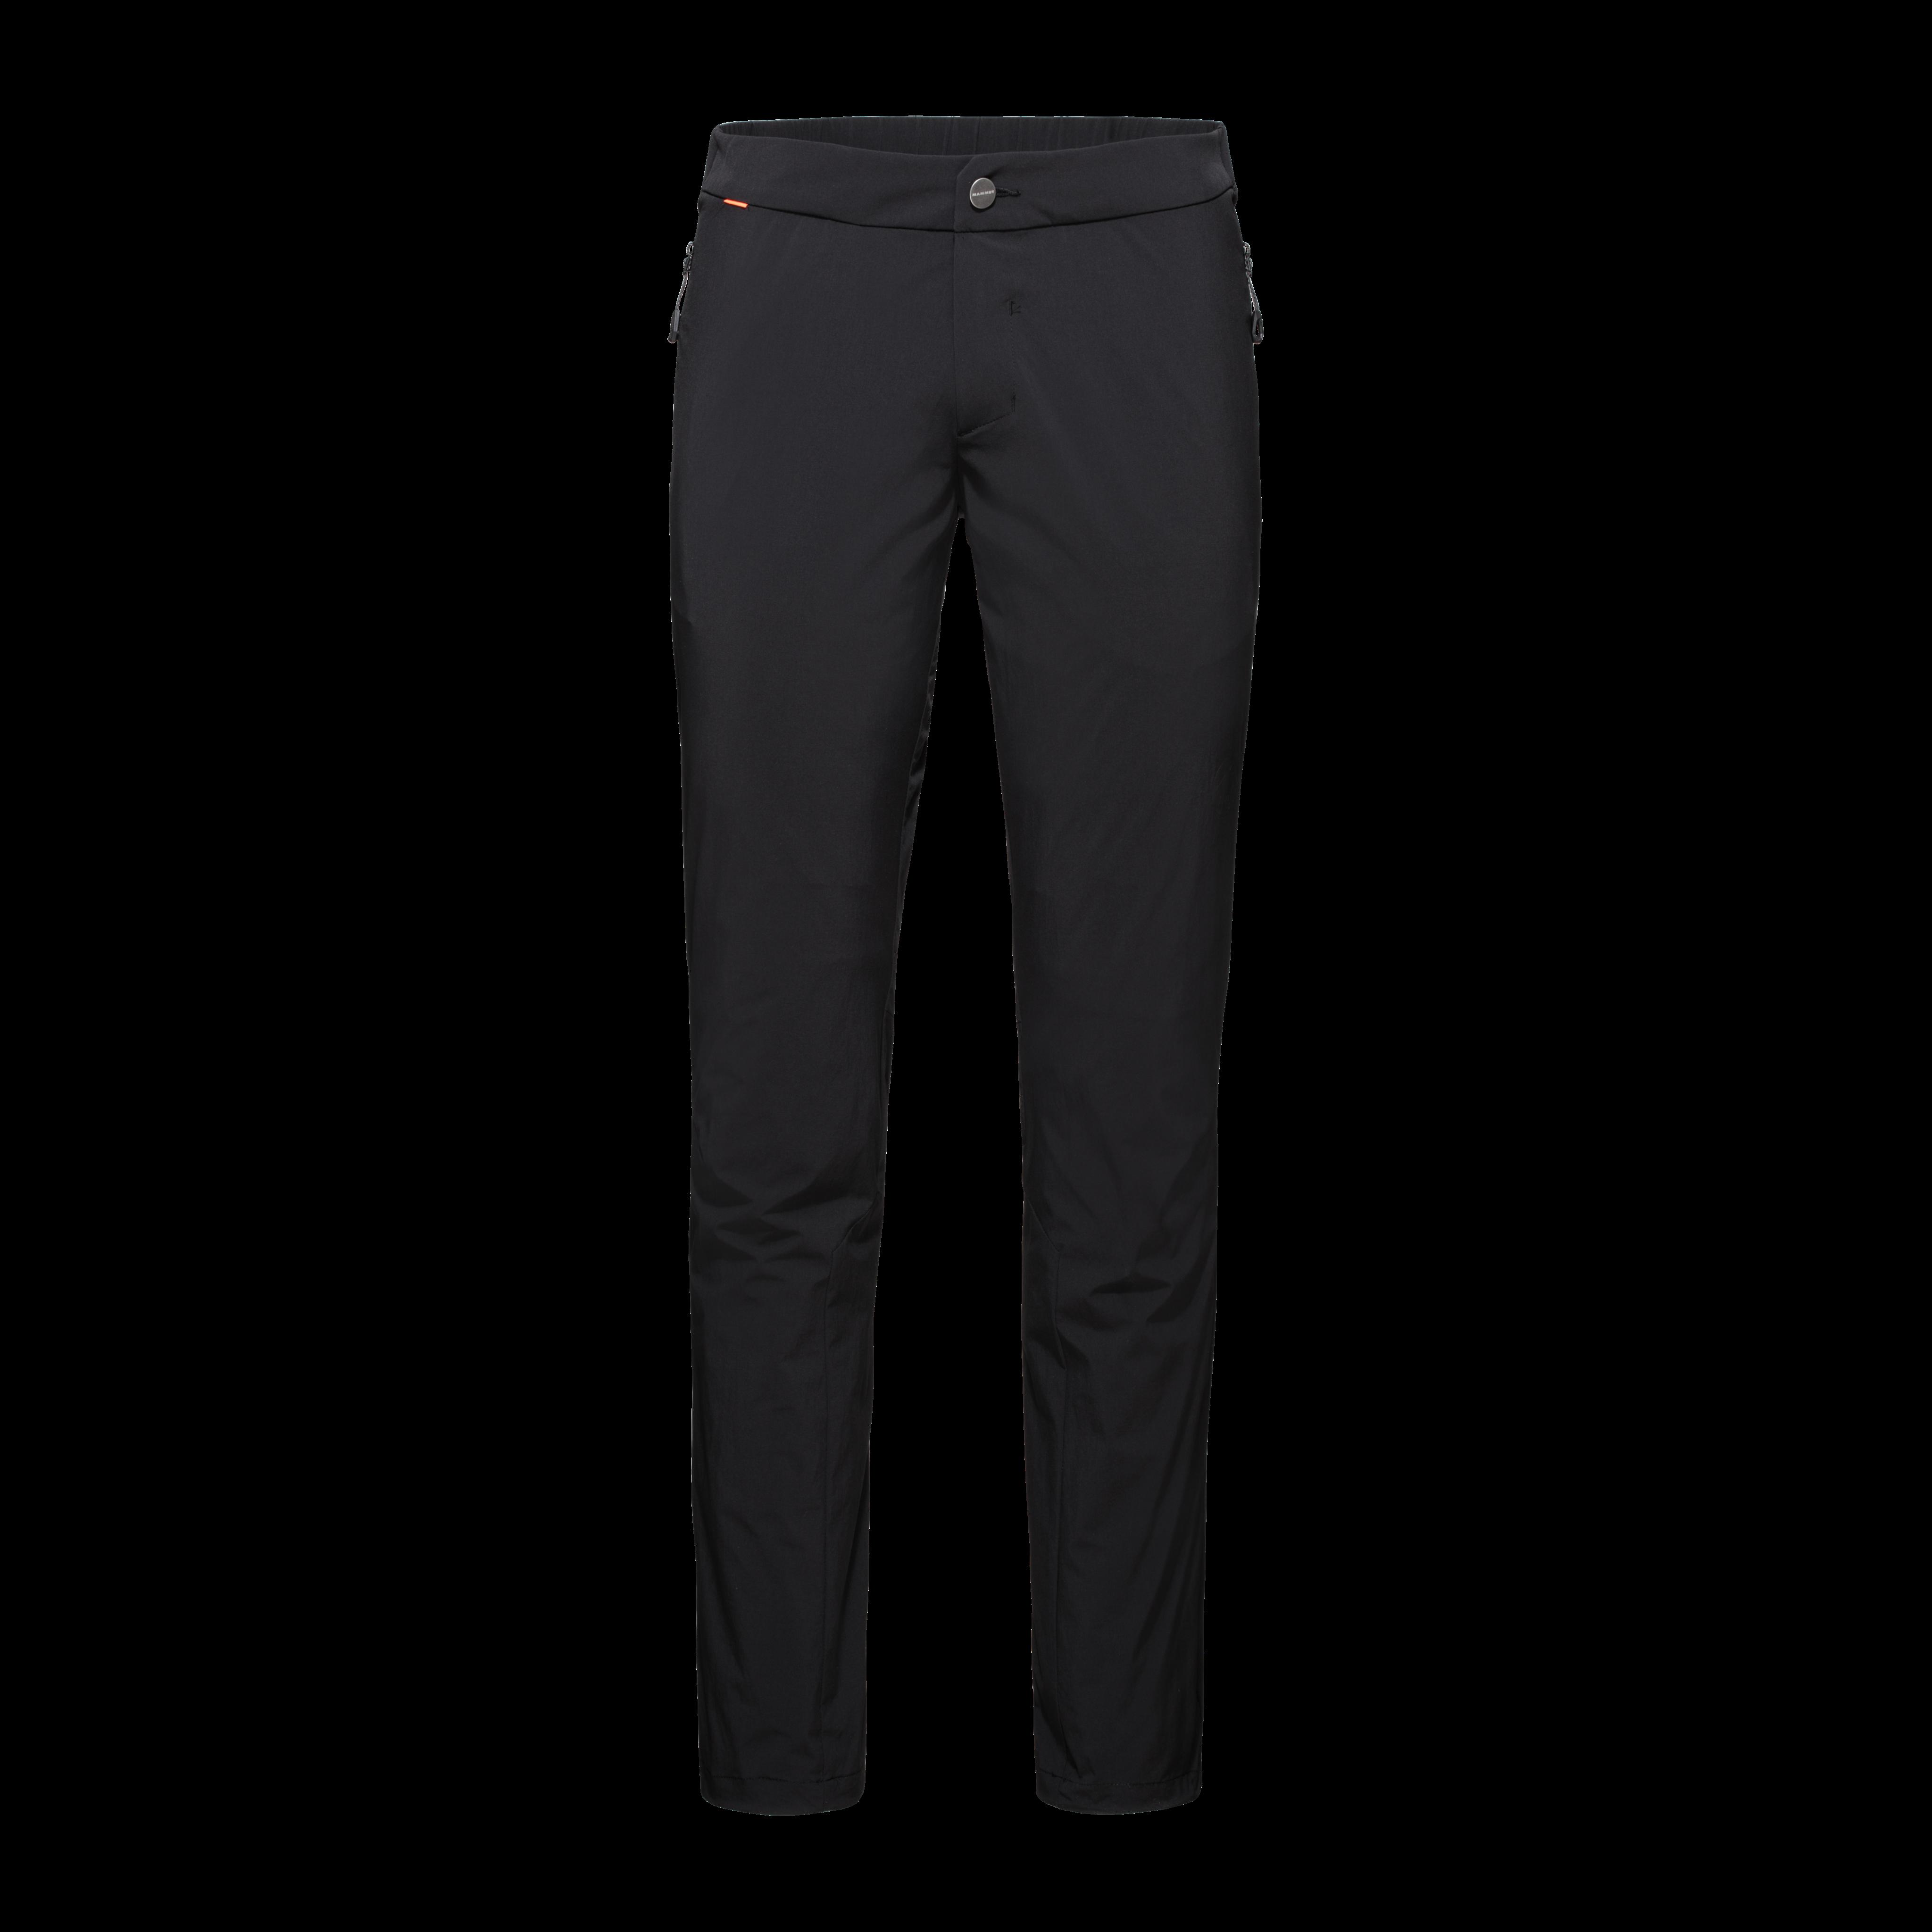 Runbold Light Pants Men - black, normal, UK 30 thumbnail